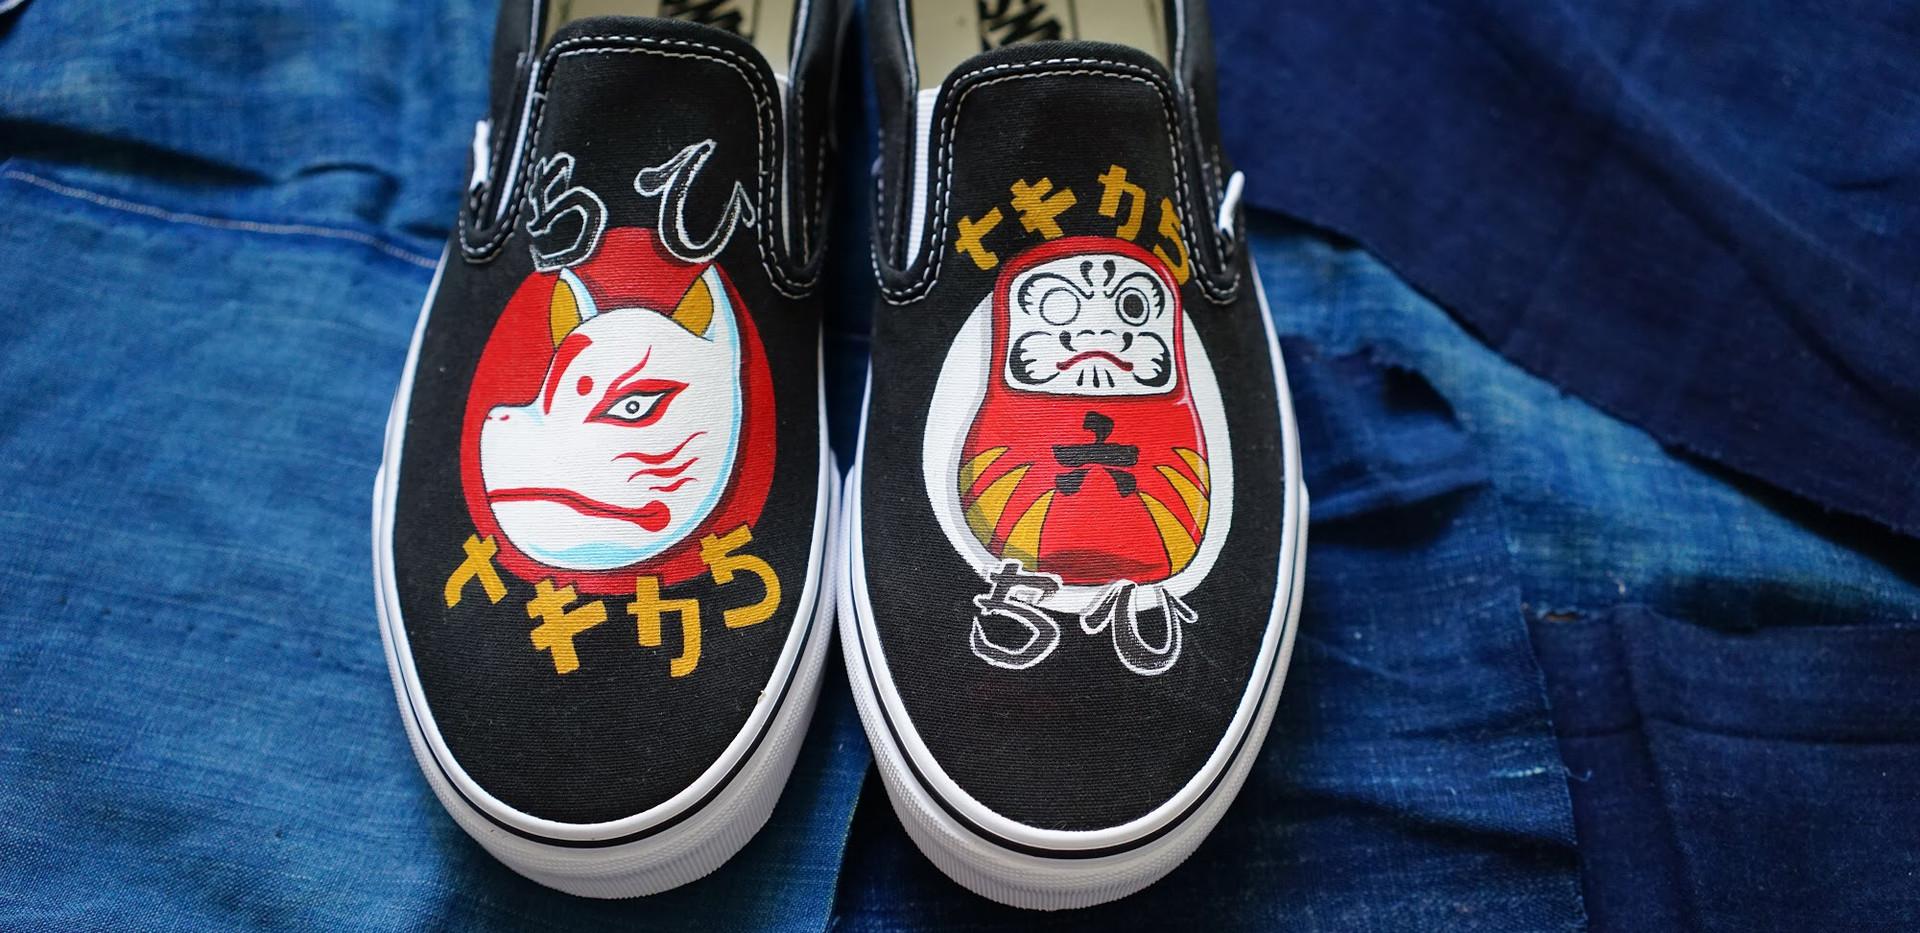 Simple Union X T.F.J.S. Vans - Cultural of Japanese 48793217789355